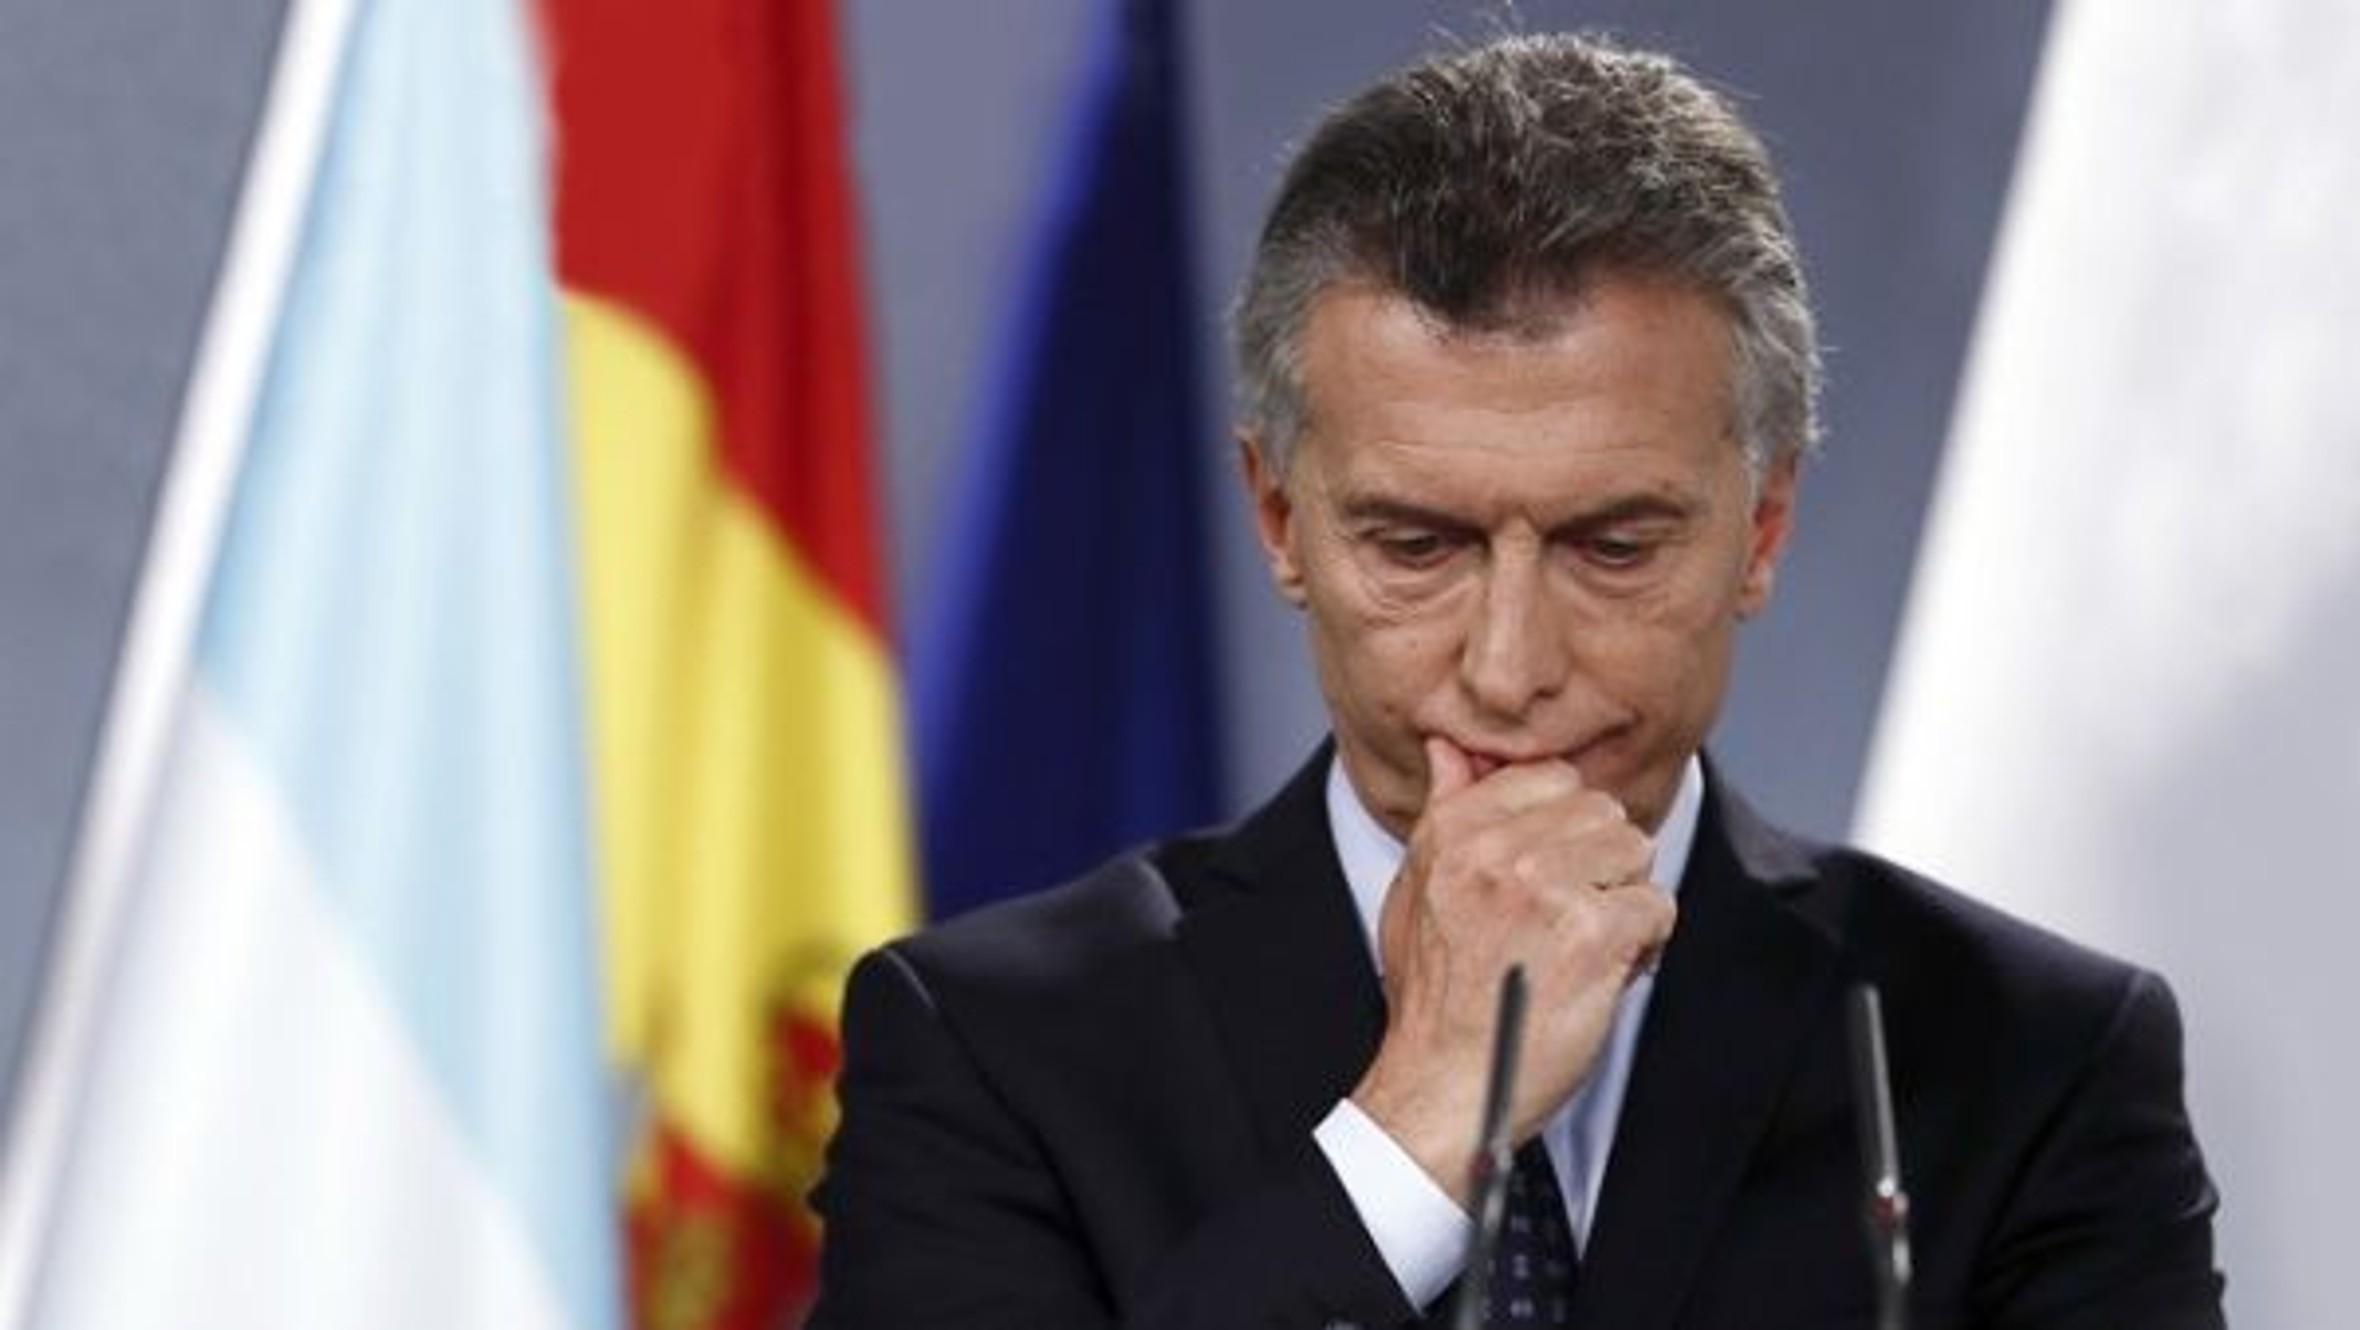 Allanaron al ex secretario de Macri en la causa por presunto espionaje